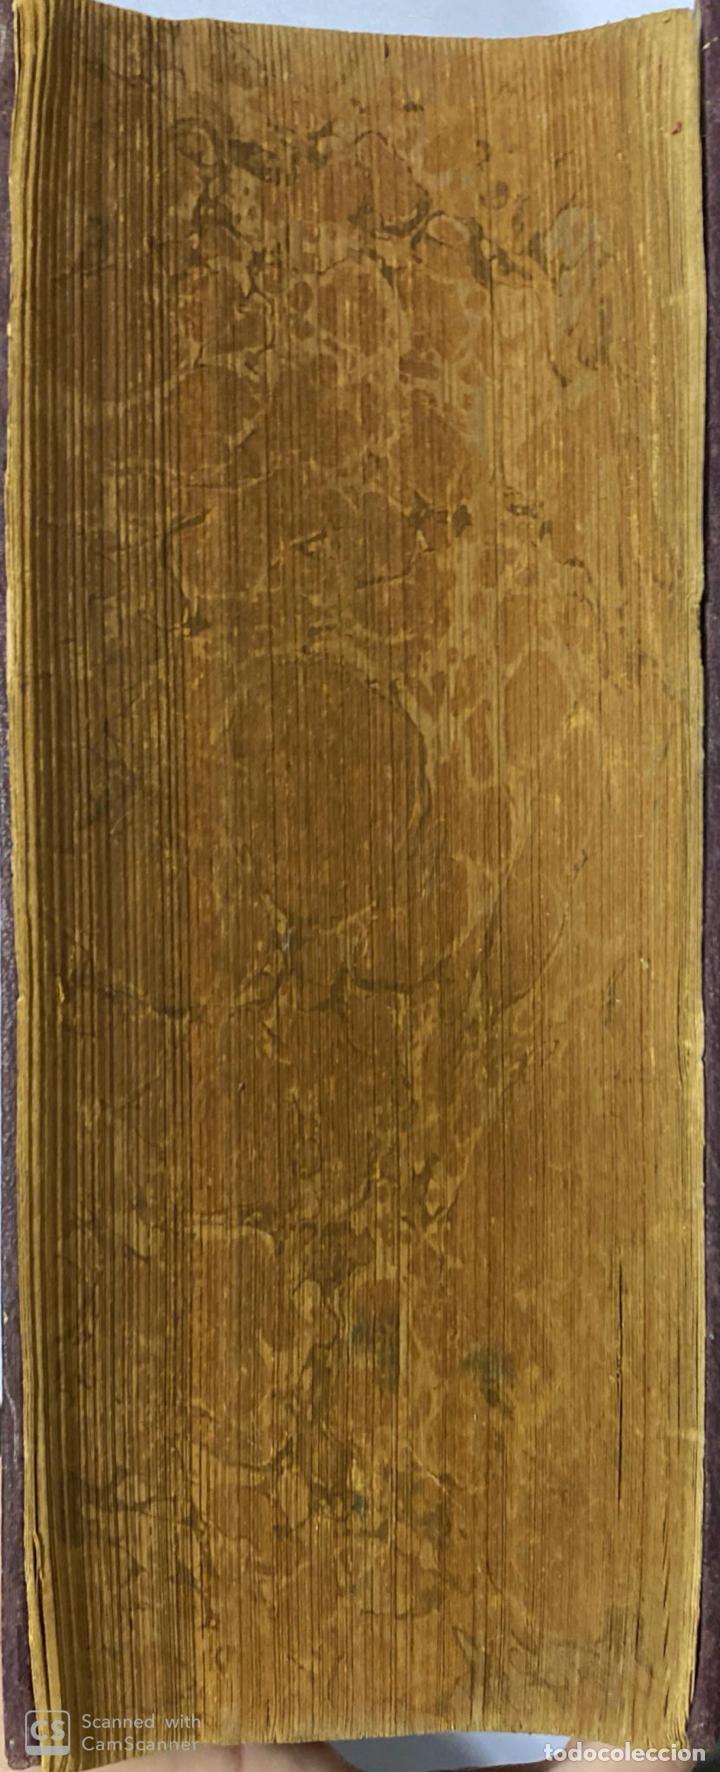 Diccionarios antiguos: WEBSTER´S. UNABRIDGED DICTIONARY. AN AMERICAN DICTIONARY OF THE ENGLISH LANGUAGE. NOAH WEBSTER, 1892 - Foto 9 - 185785466